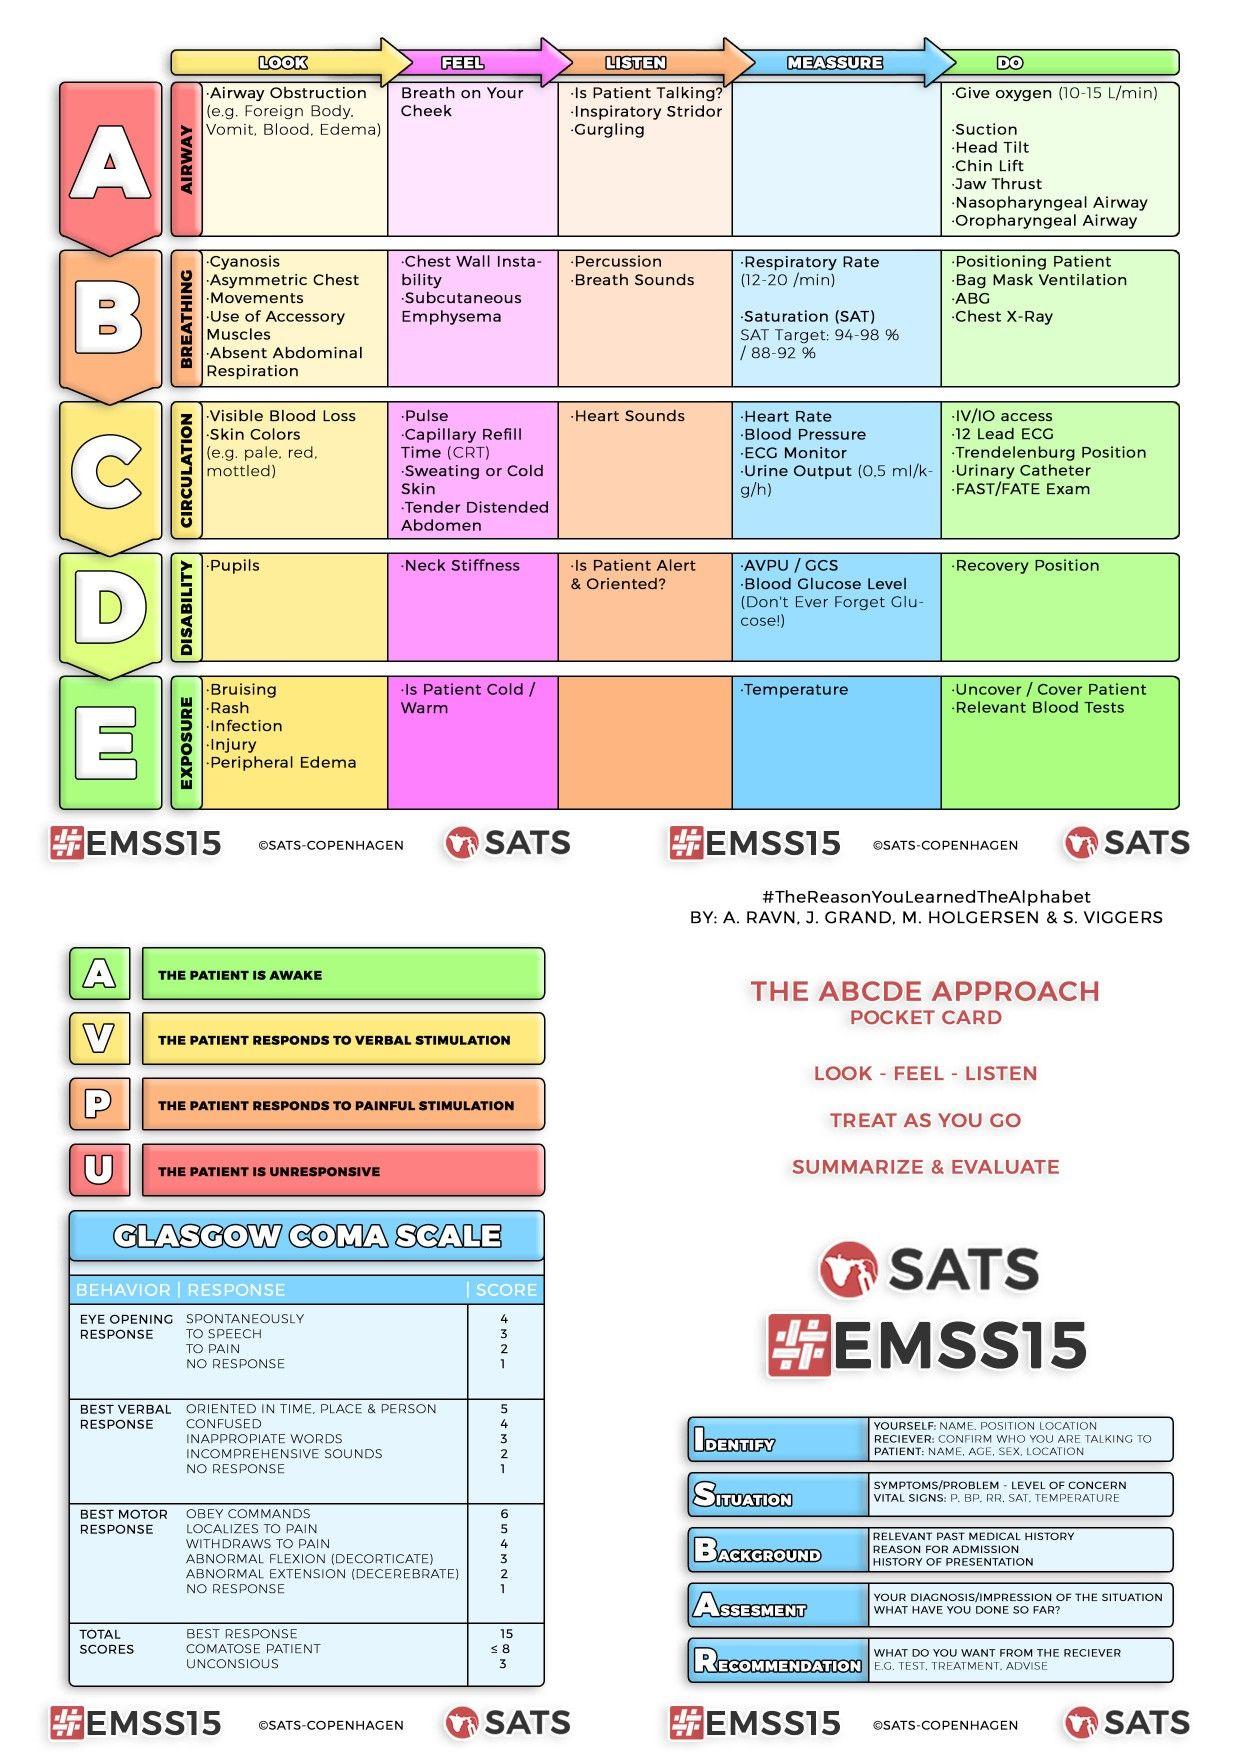 Abcde chart emergency room nurse nursing care tips notes nclex also paramedic pinterest charting for nurses rh